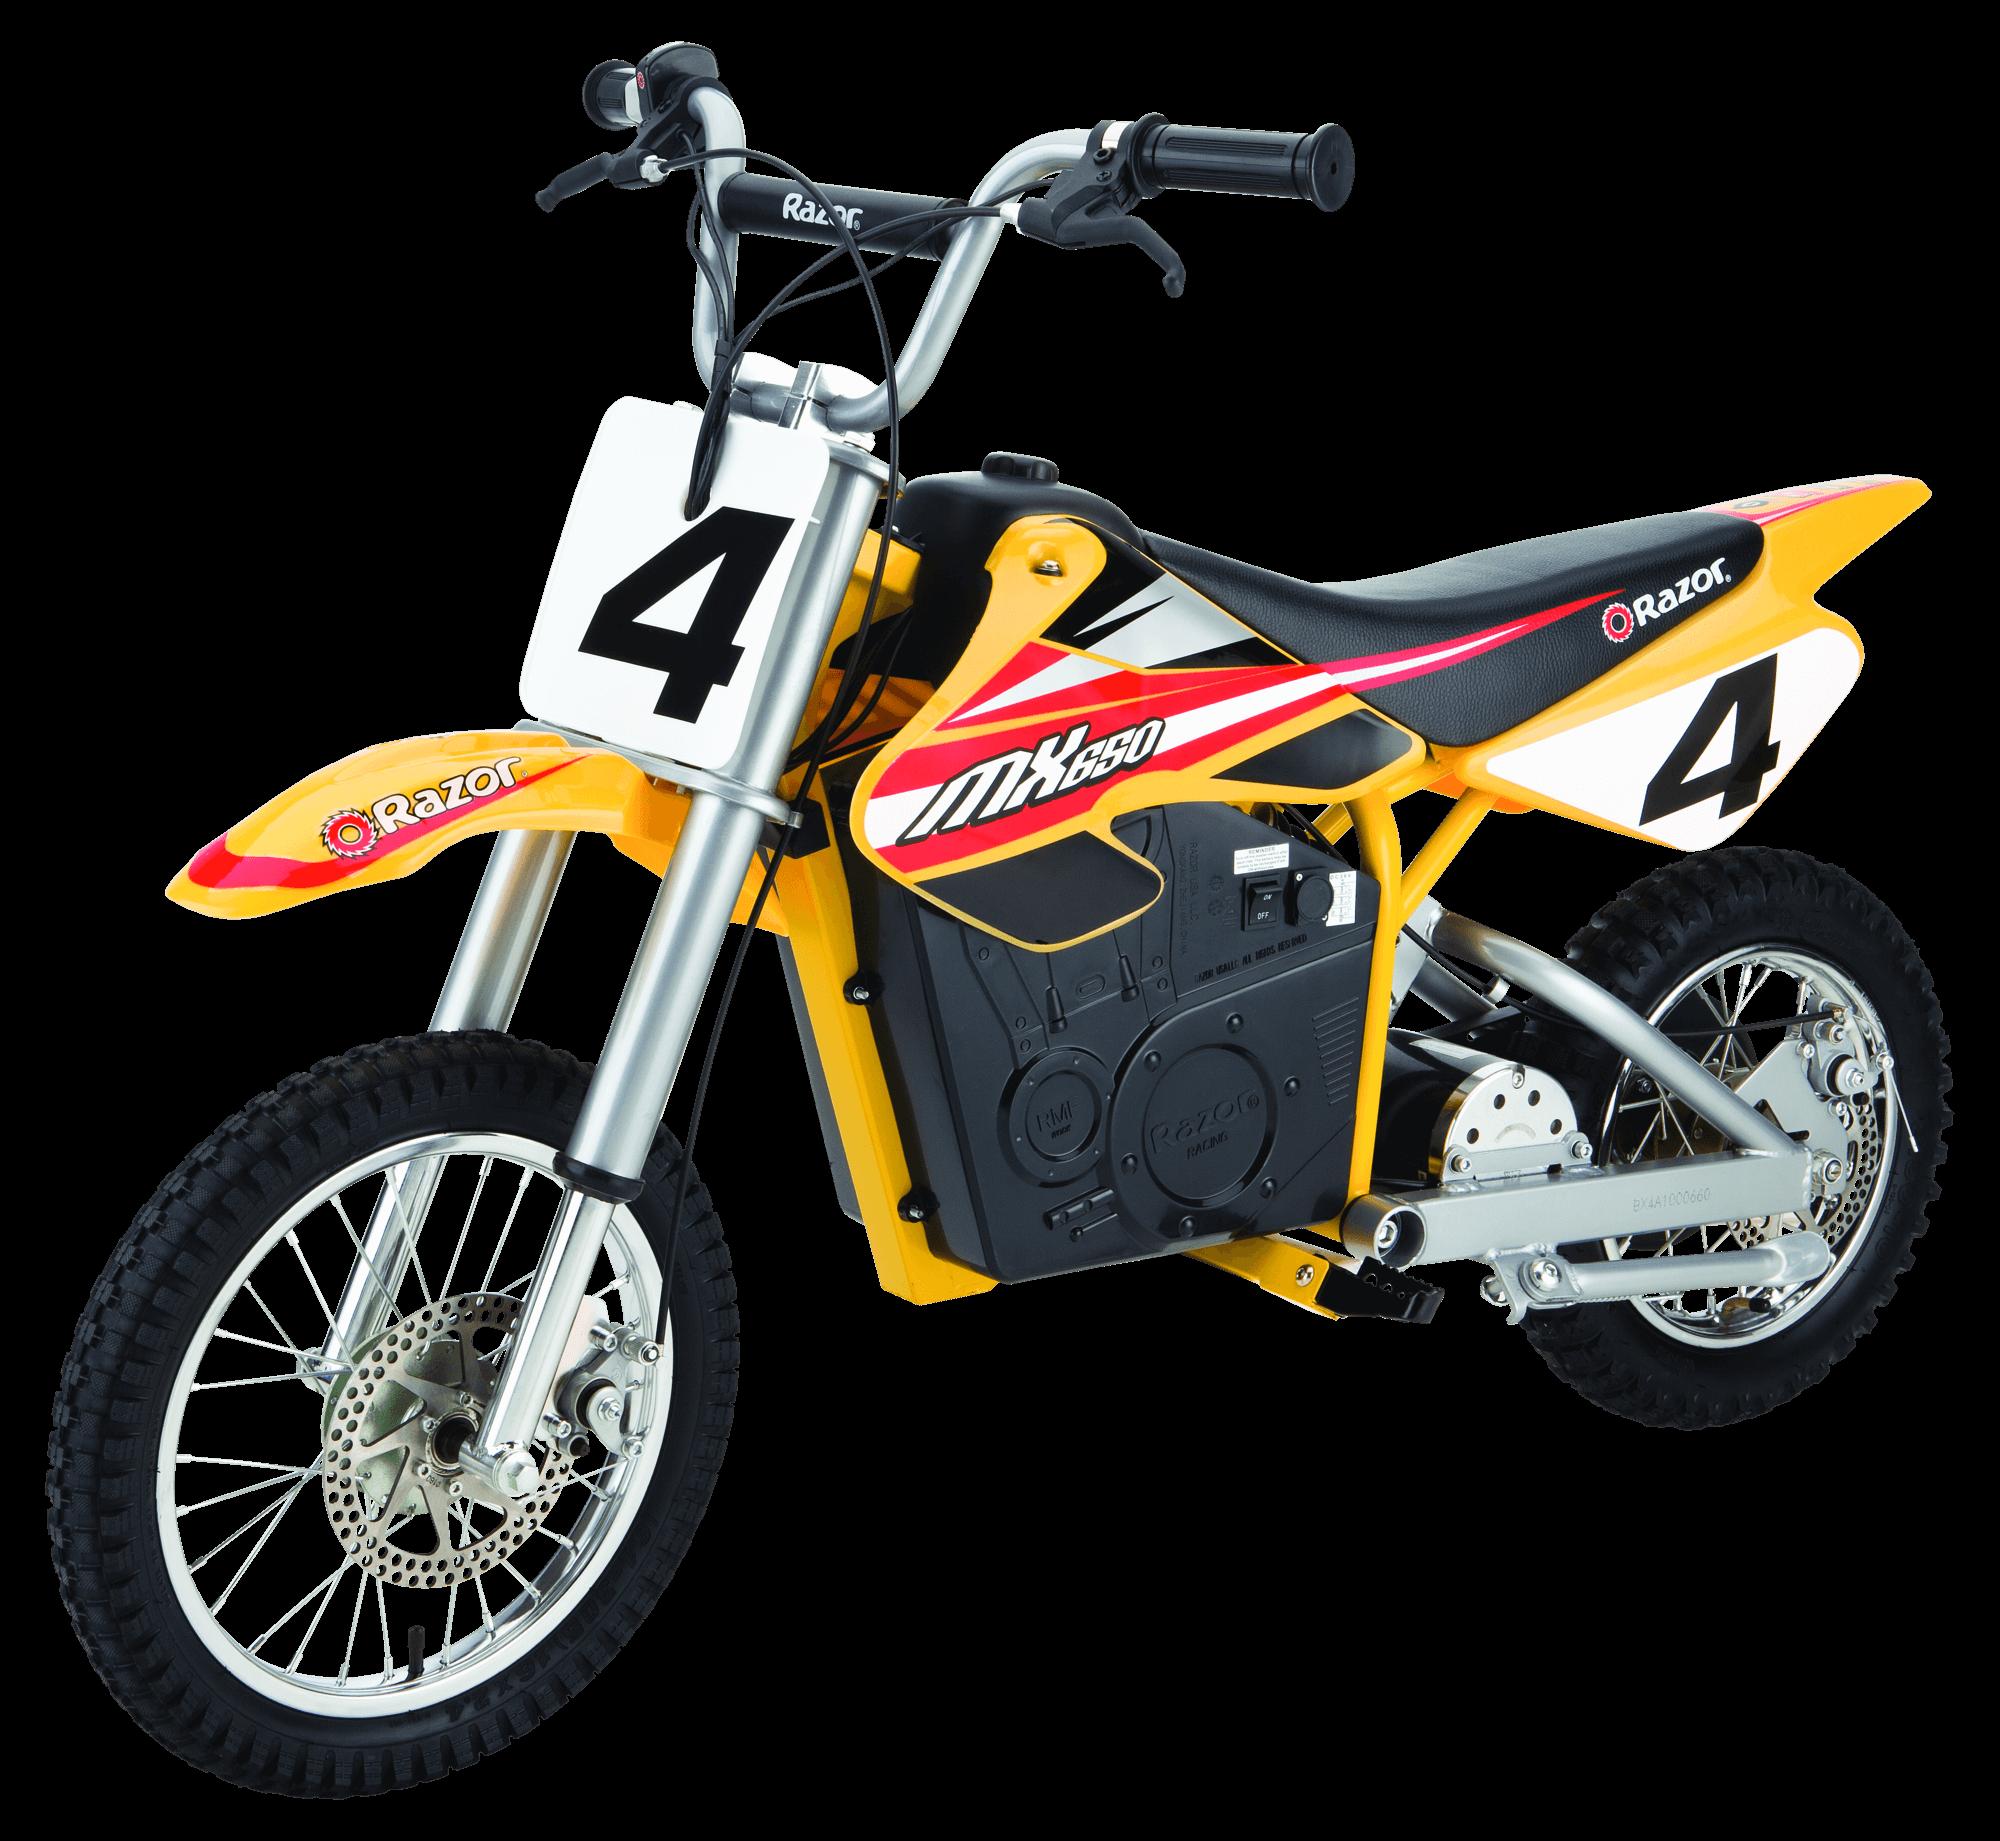 Mx650 Dirt Rocket Razor Evo E Bike 24v Wiring Diagram Previous